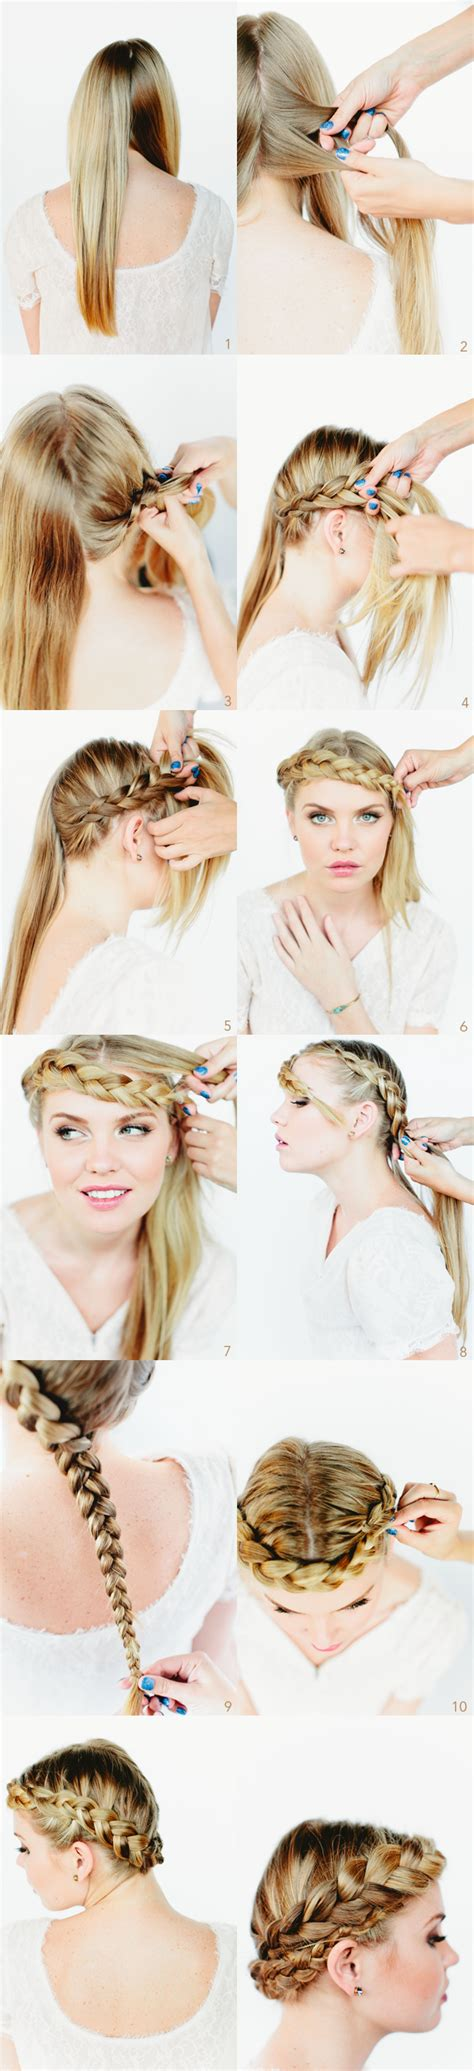 15 braided updo hairstyles tutorials 9 types of braided hairstyle tutorials you should